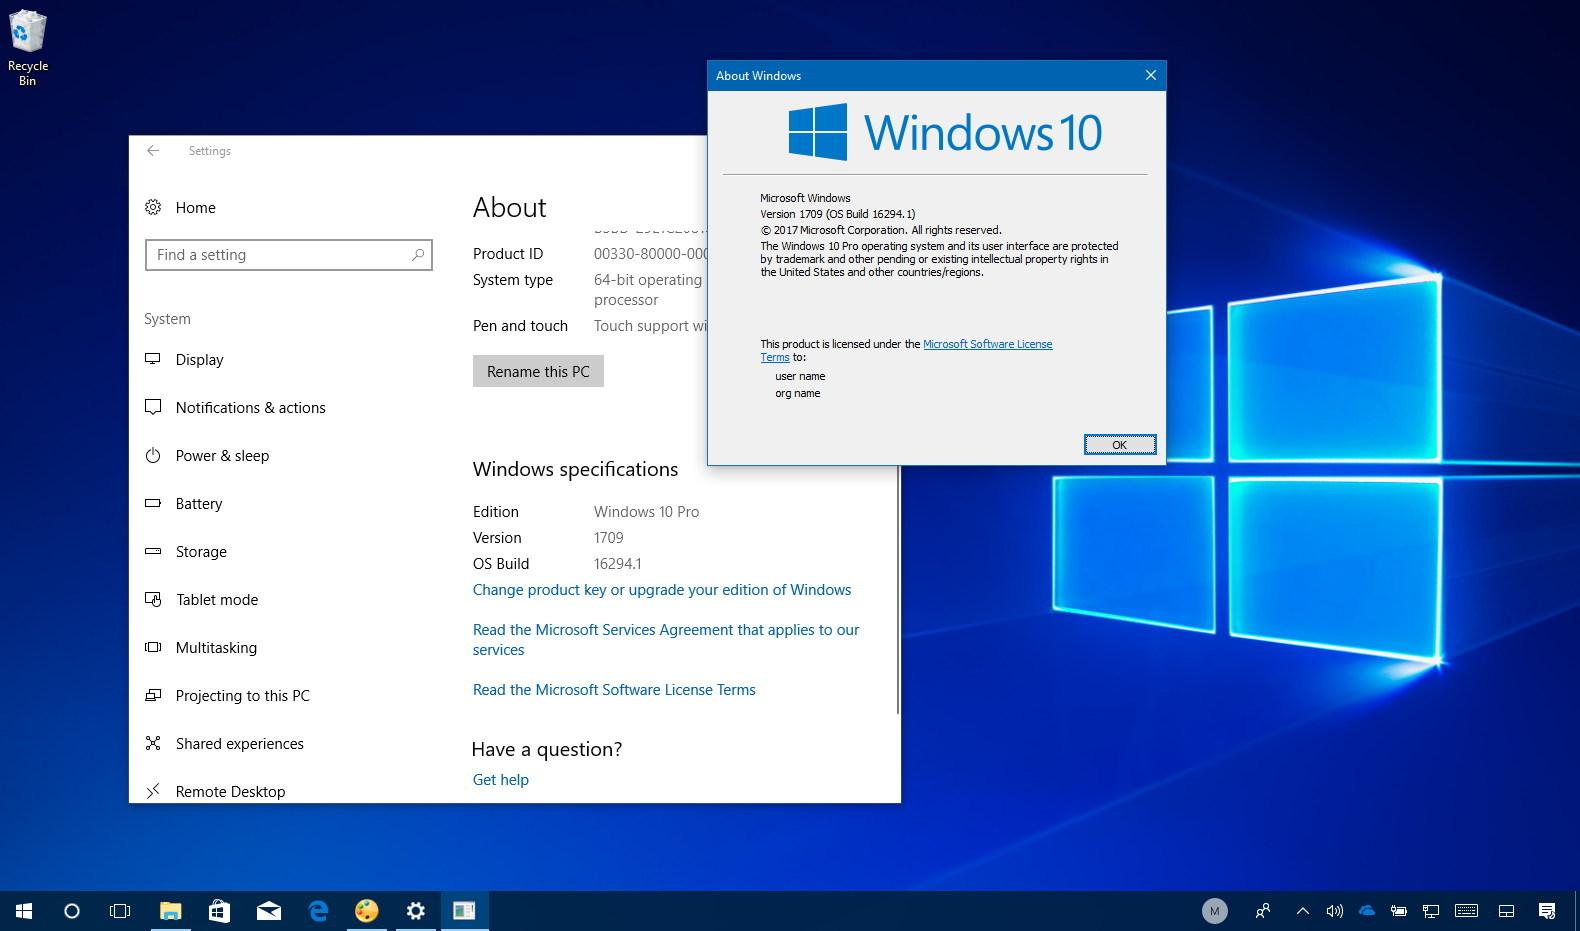 Windows 10 Fall Creators Update installation check